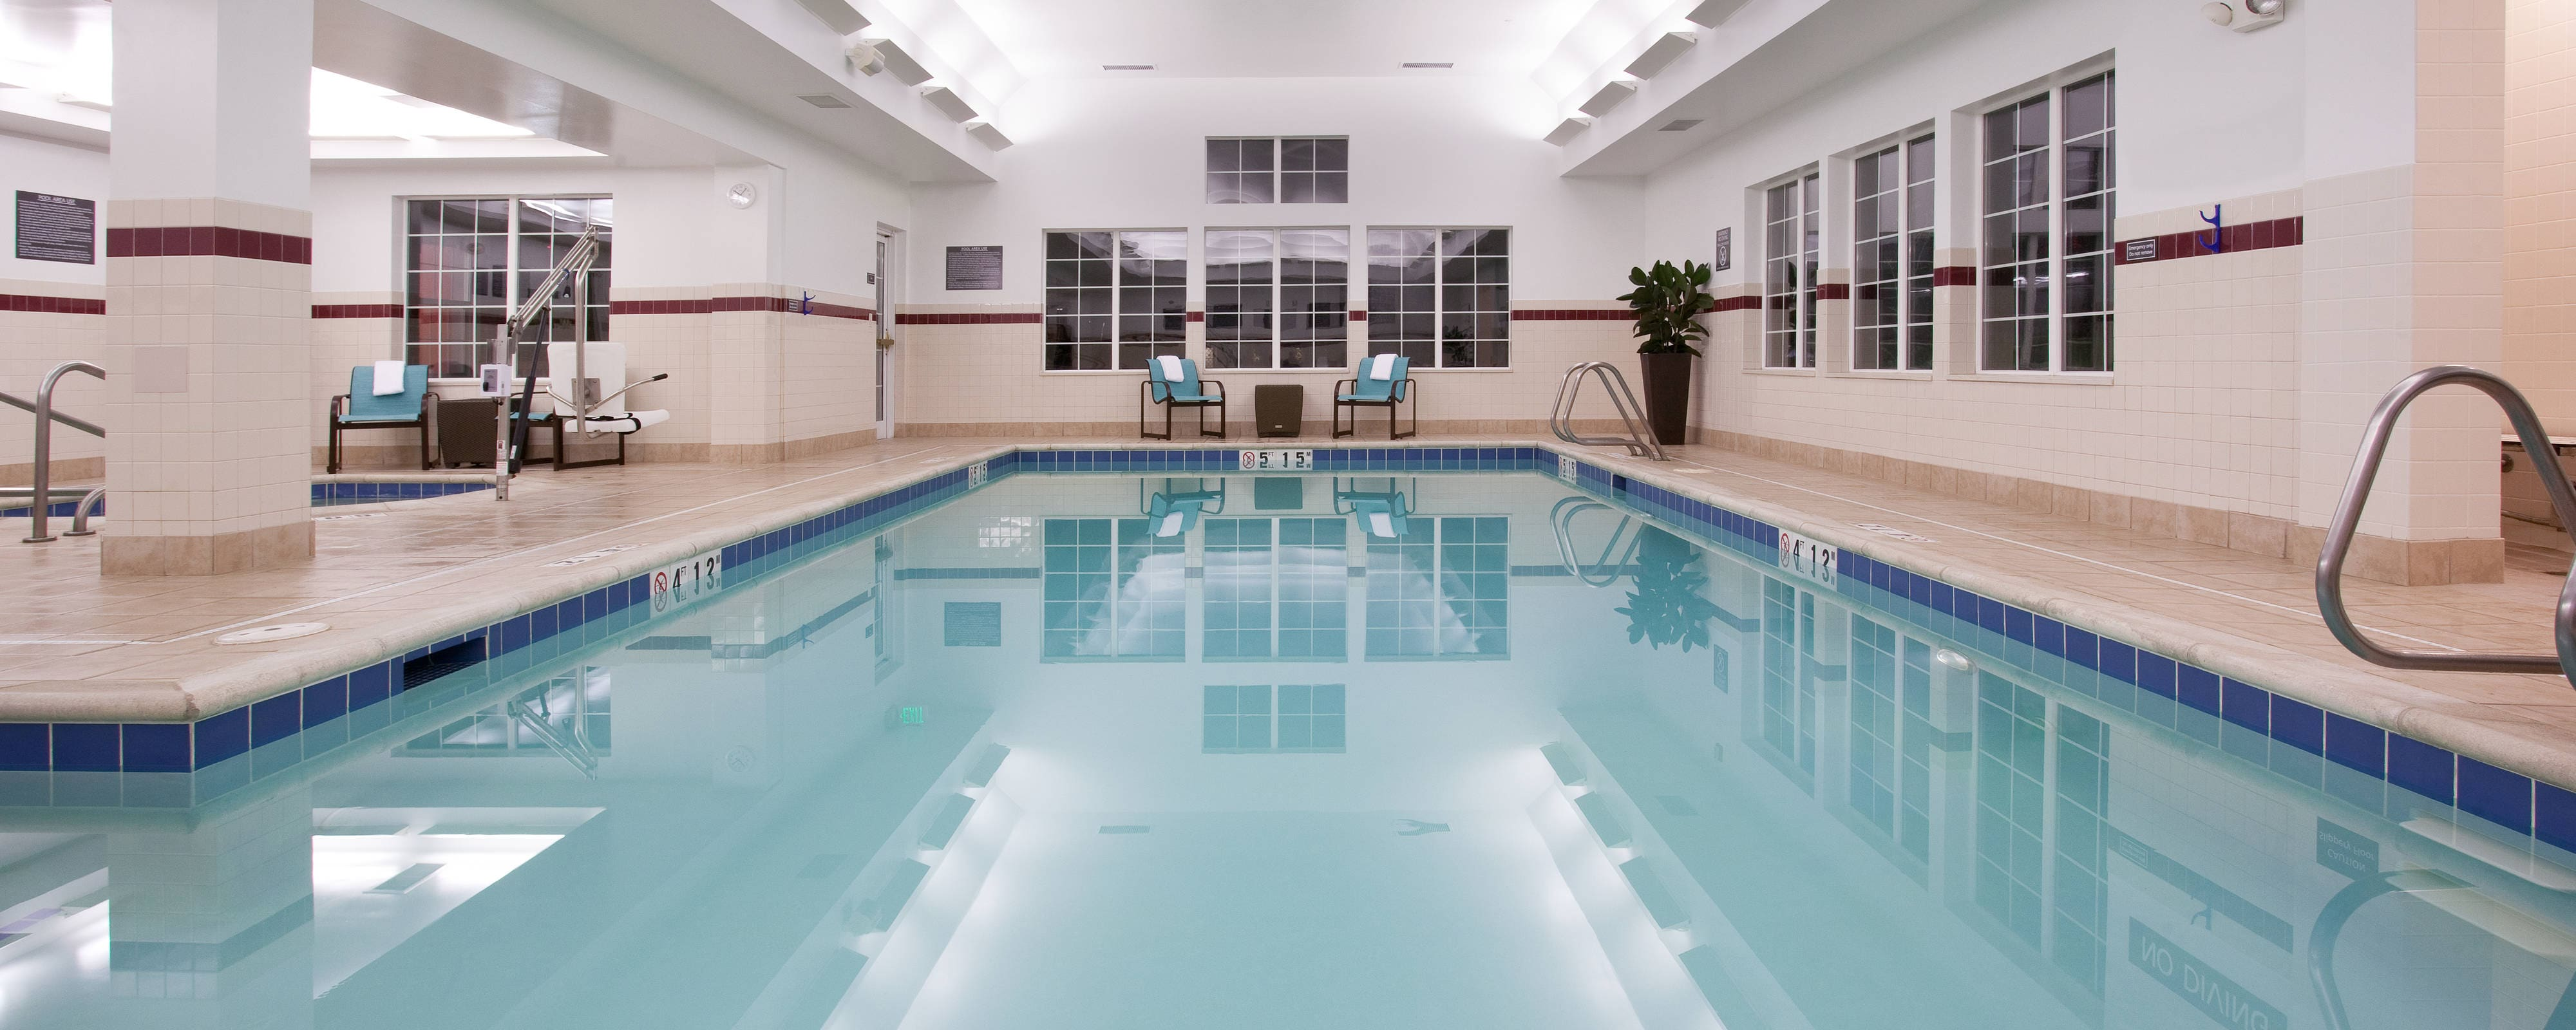 Hotels Near Salt Lake City Residence Inn Salt Lake City